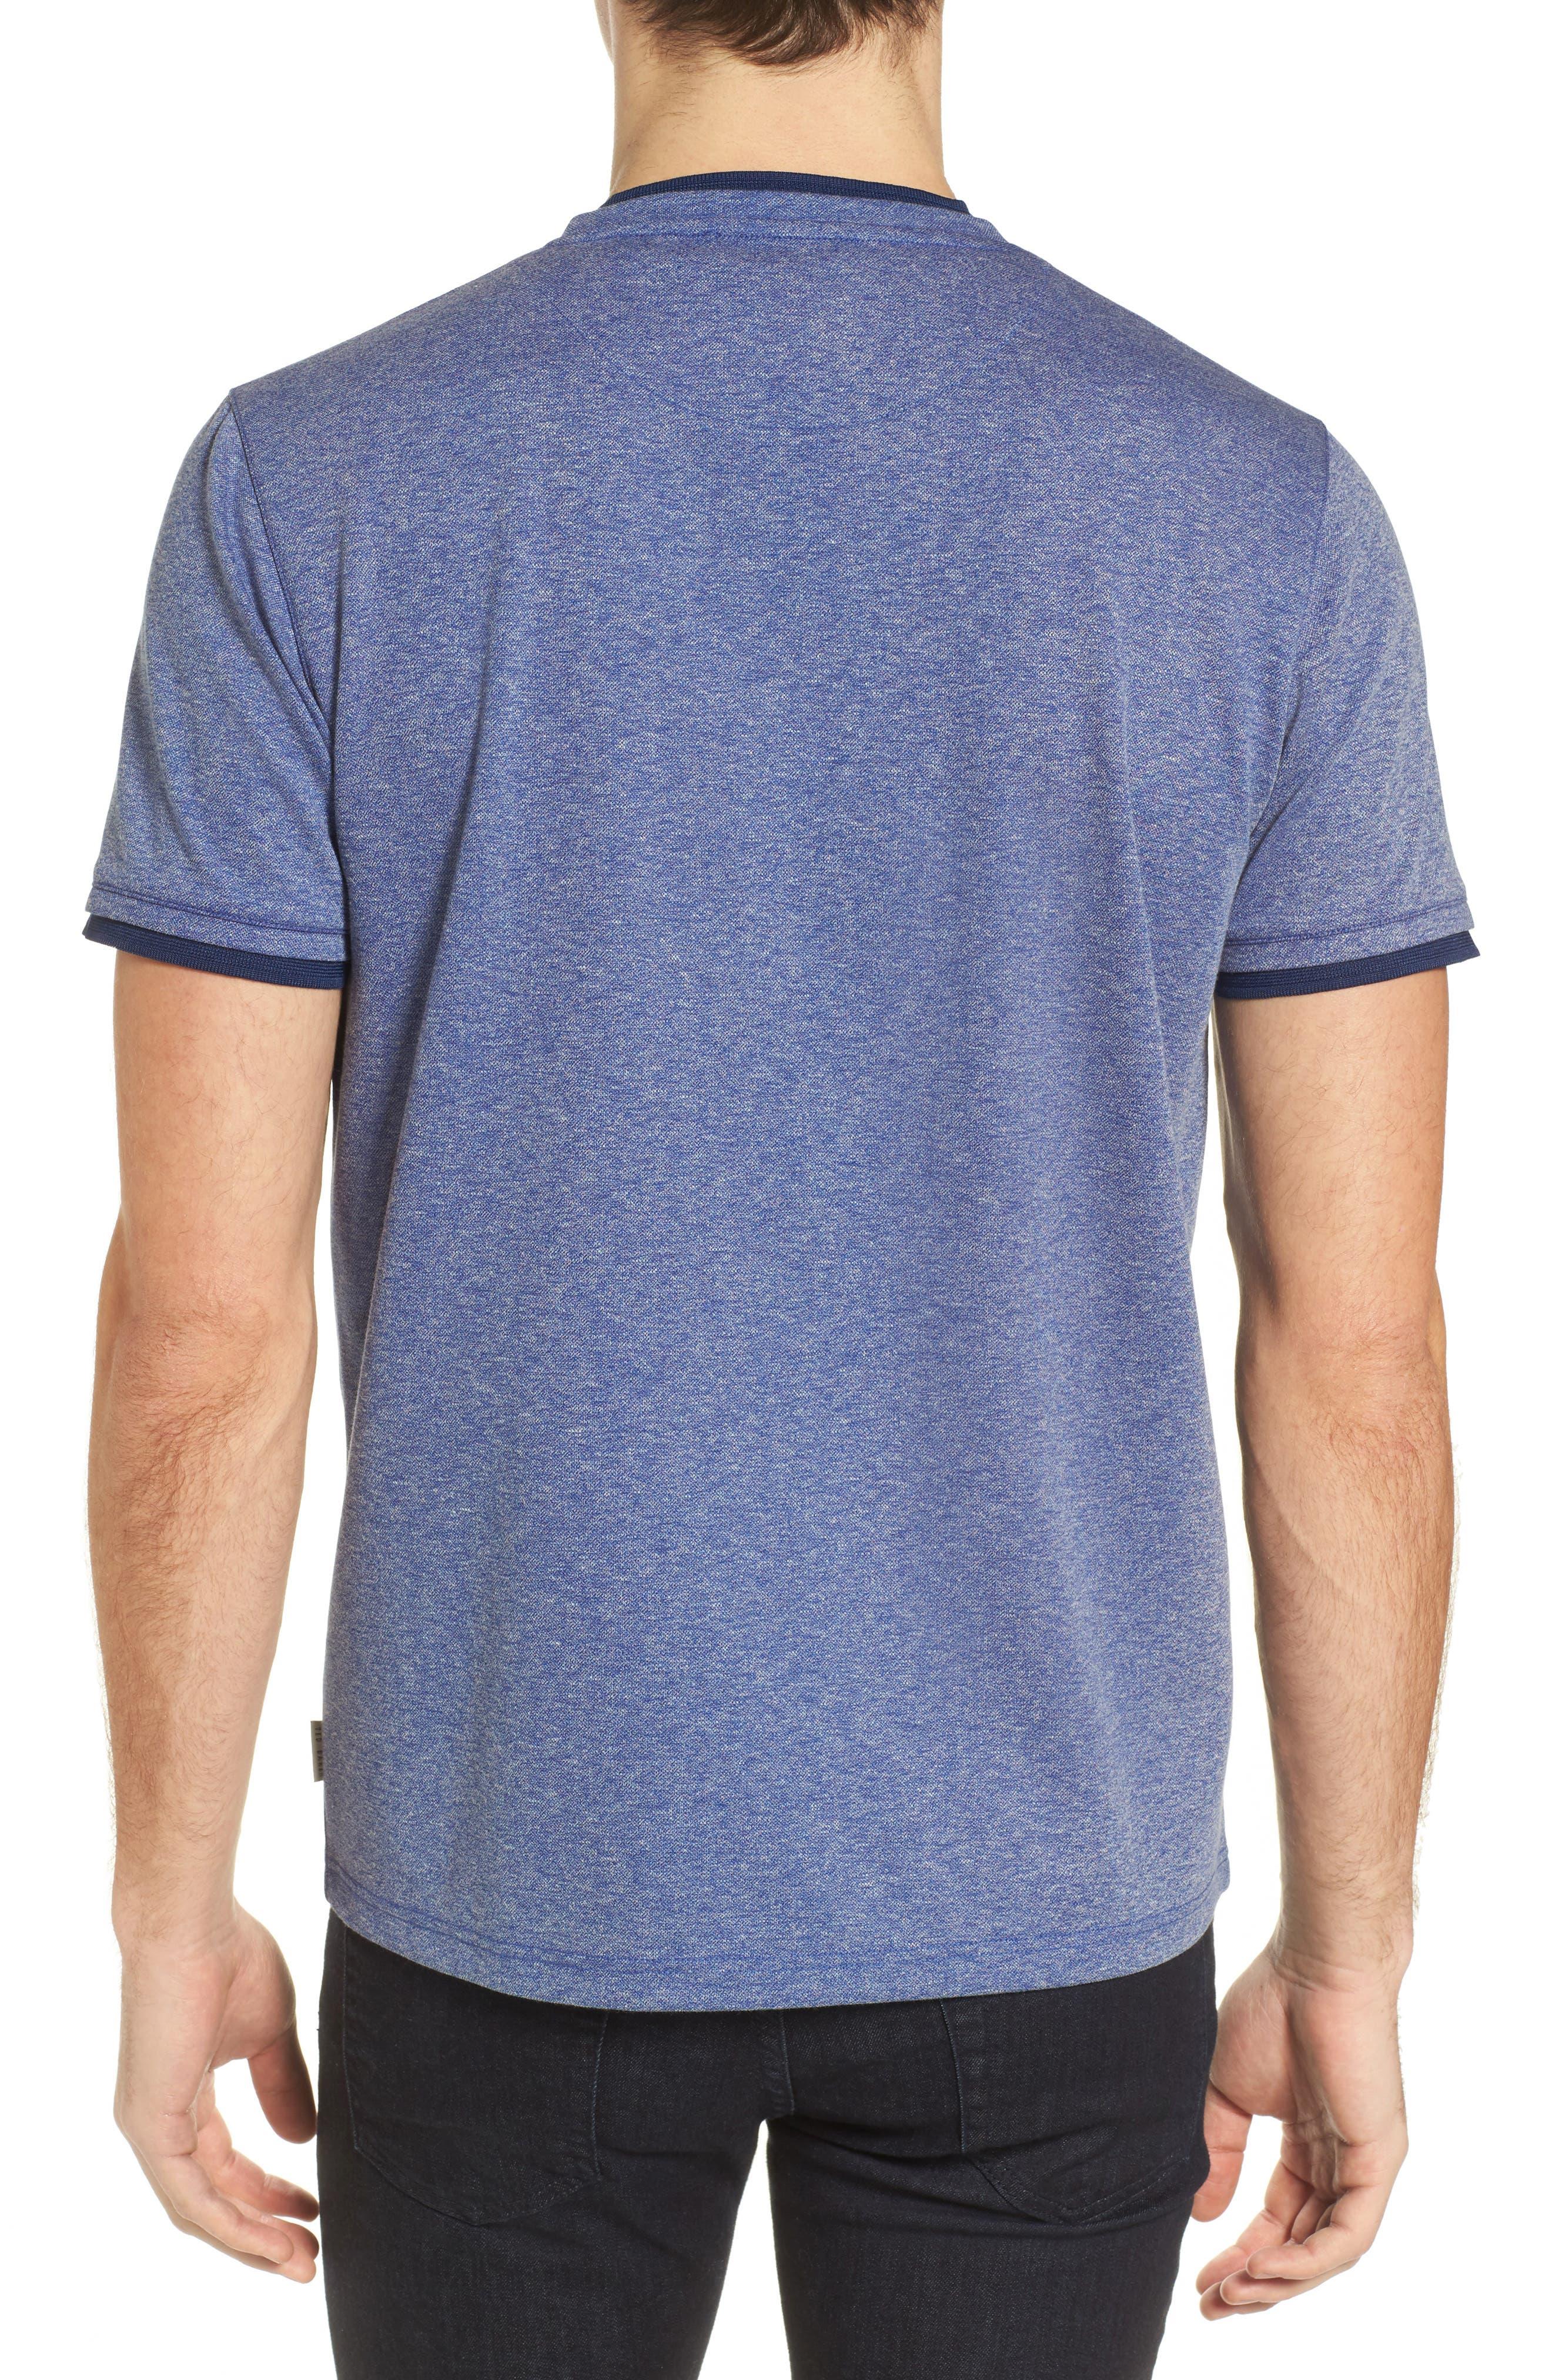 Alternate Image 2  - Ted Baker London Climb Mouline Layered Pocket T-Shirt